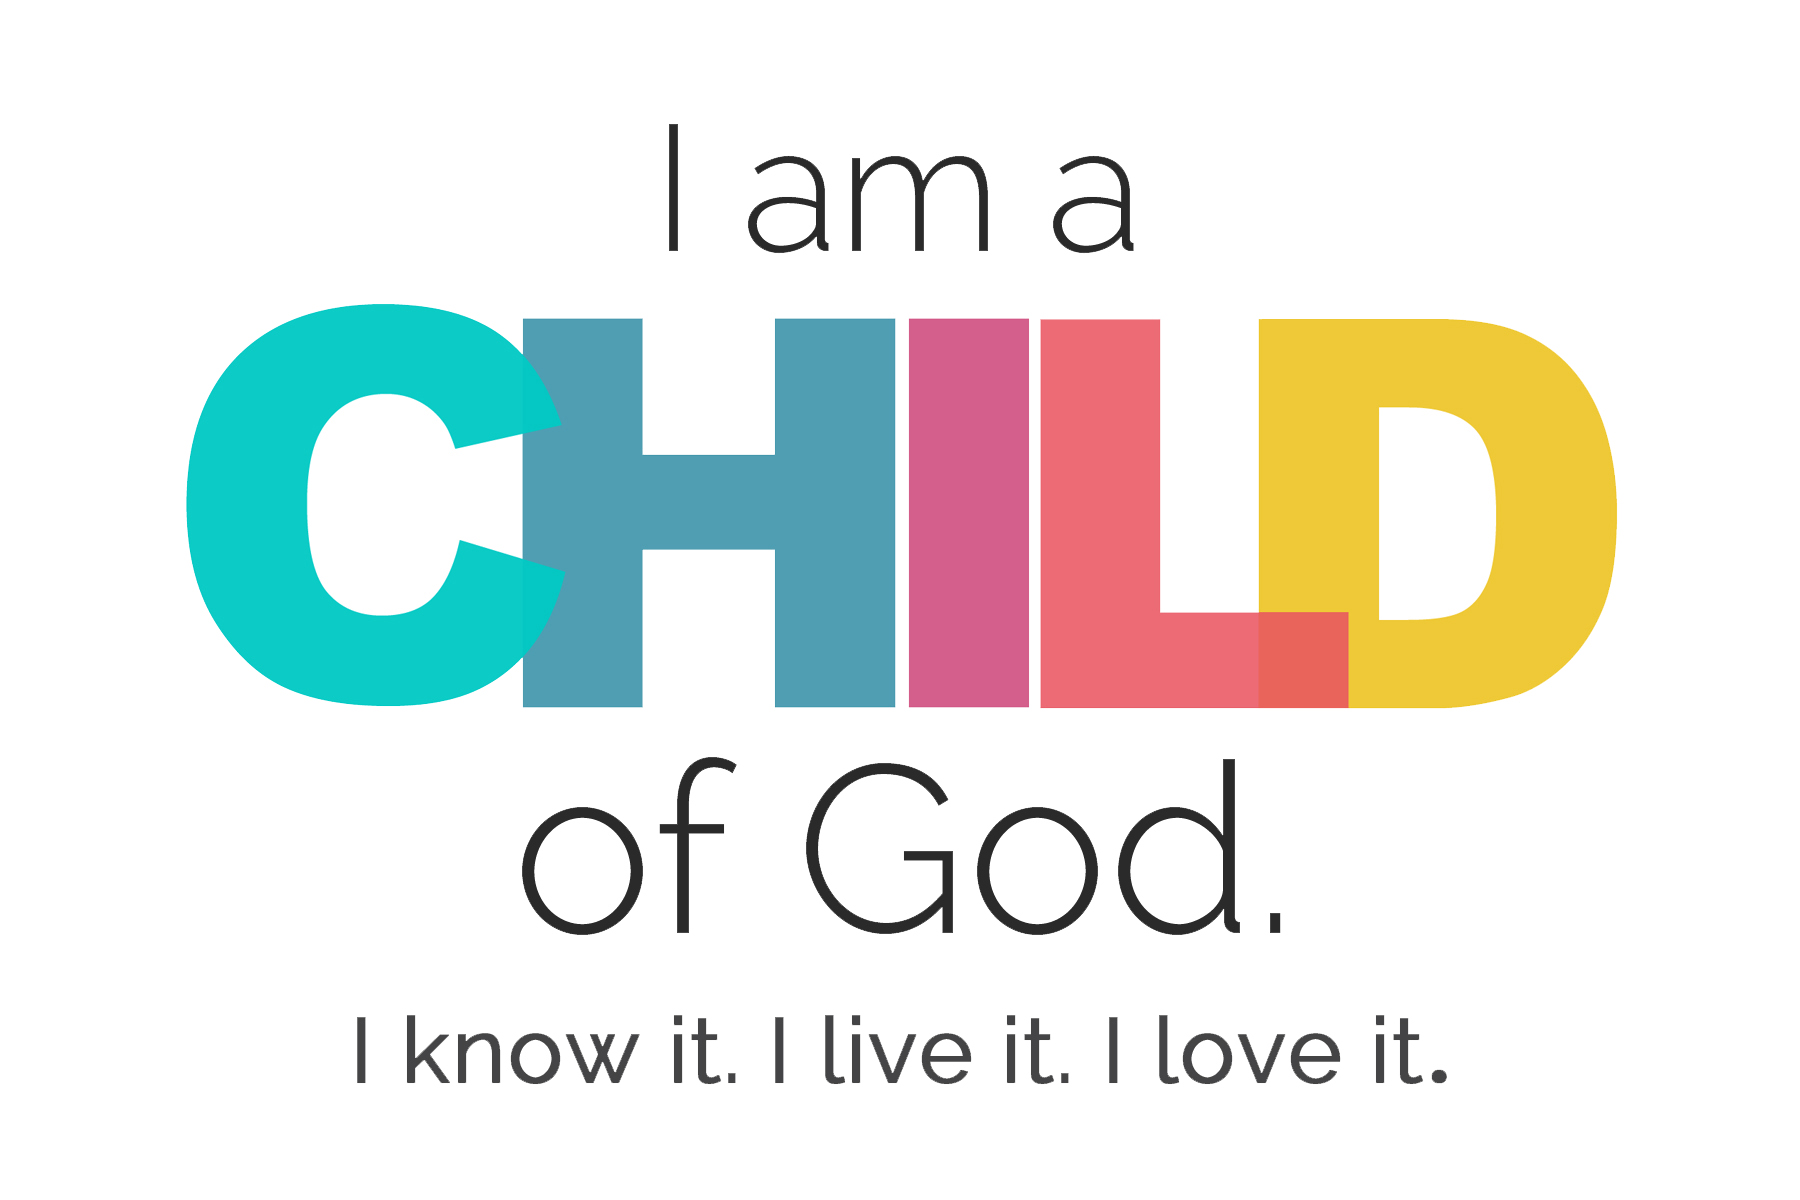 i-am-a-child-of-god-4x6.jpg